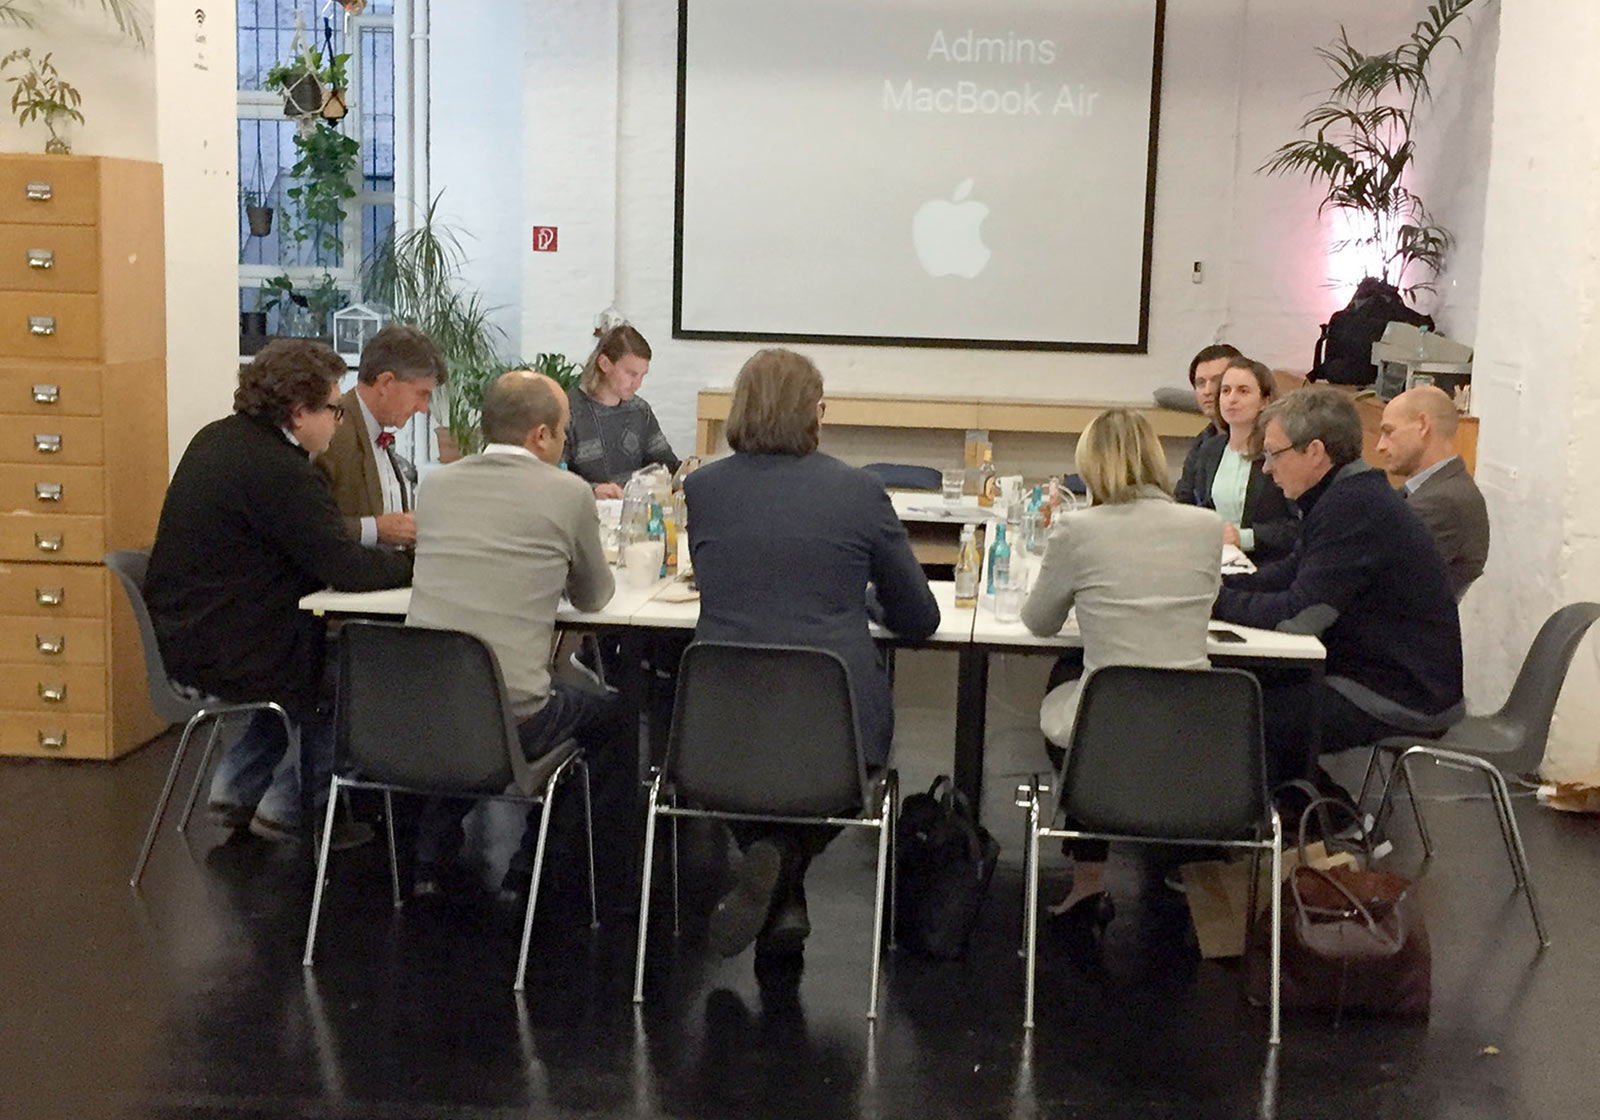 The jury. Photo: jovoto